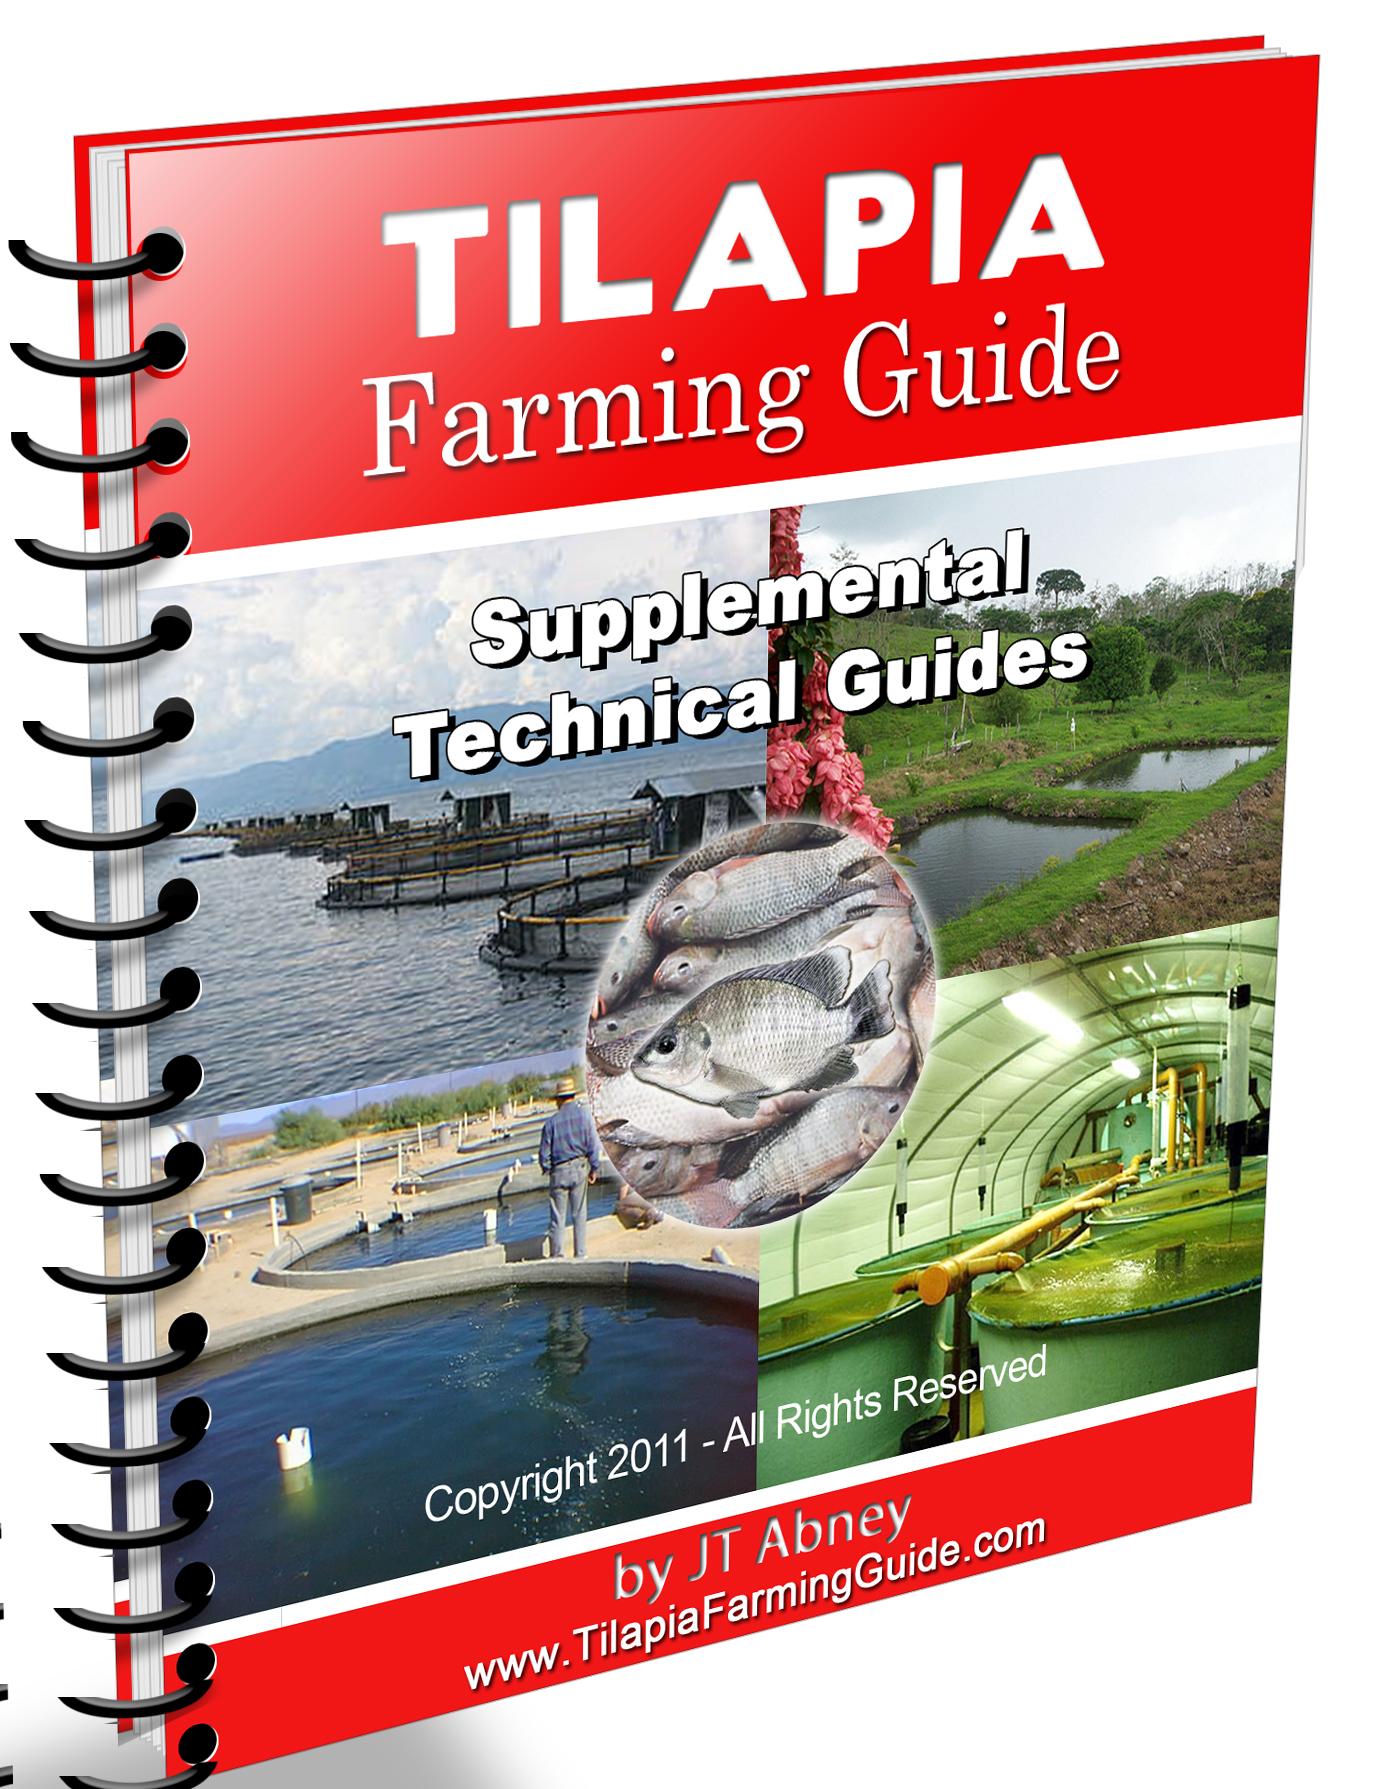 tilapia farming guide rh tilapiafarming net tilapia farming guide book tilapia farming guide download